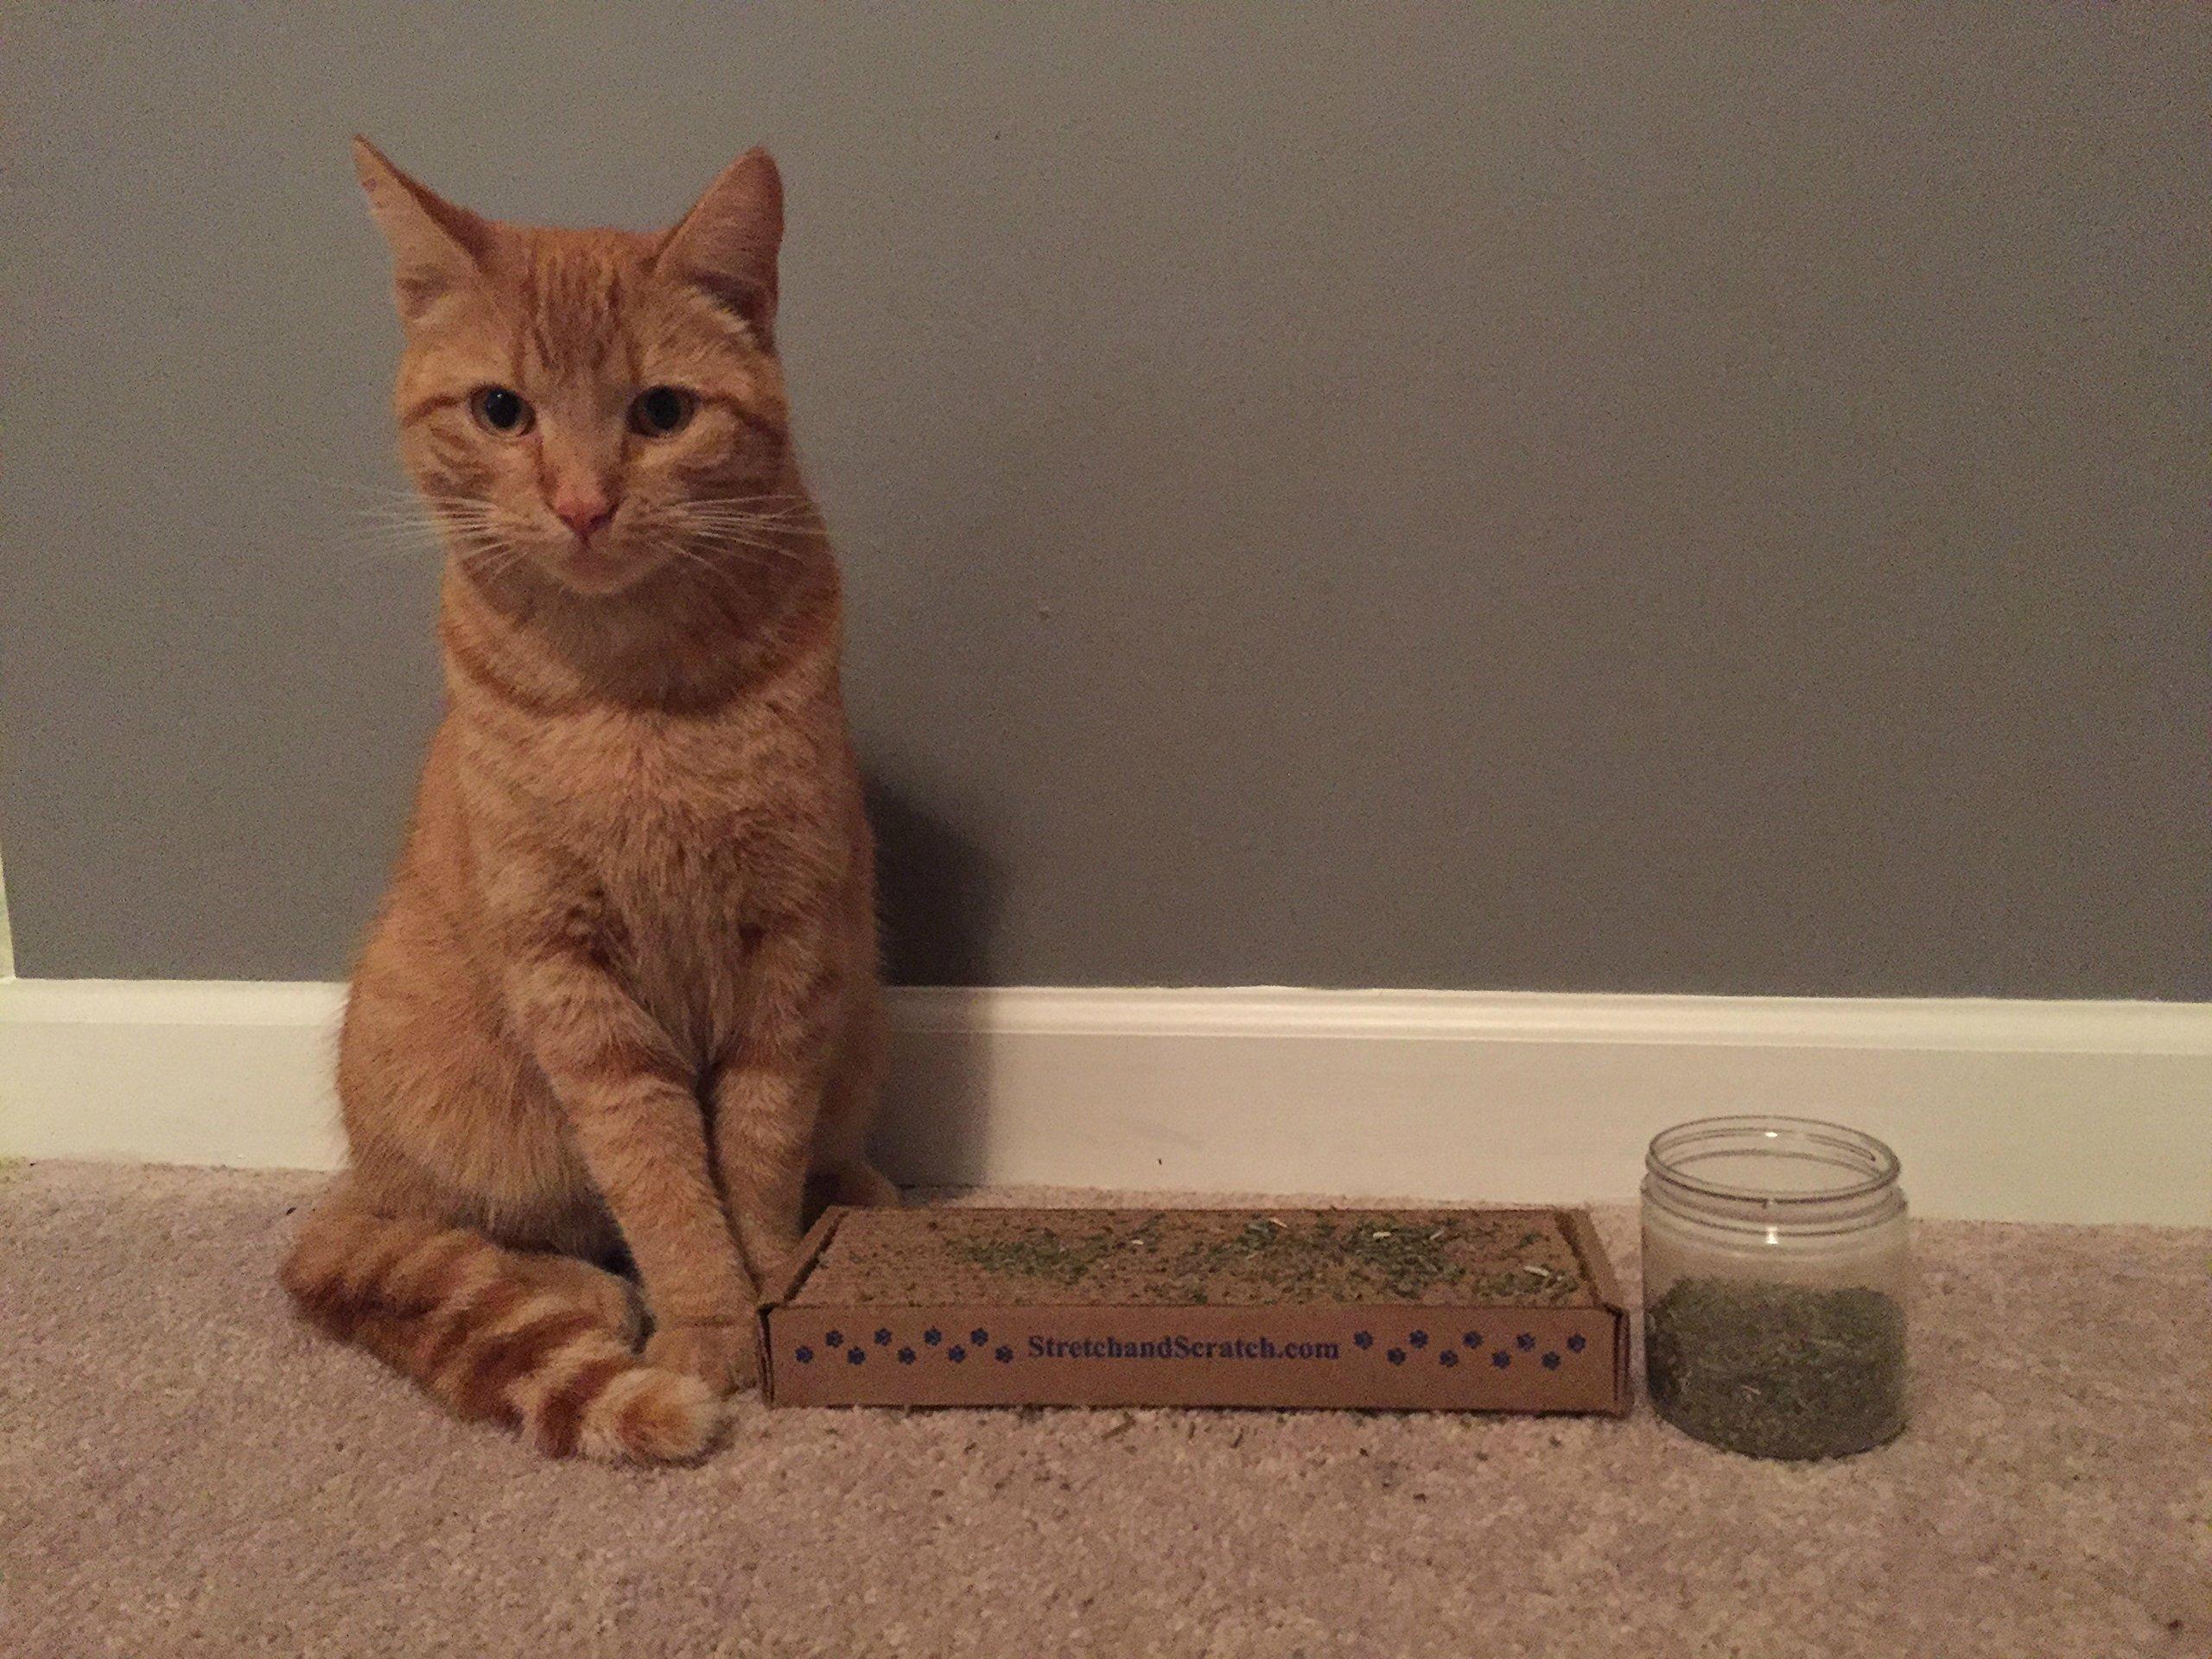 Garry's Pets Catnip - Our Maximum Potency Premium Blend Nip That Your Cats Will Go Crazy Over (20 Pound Carton)